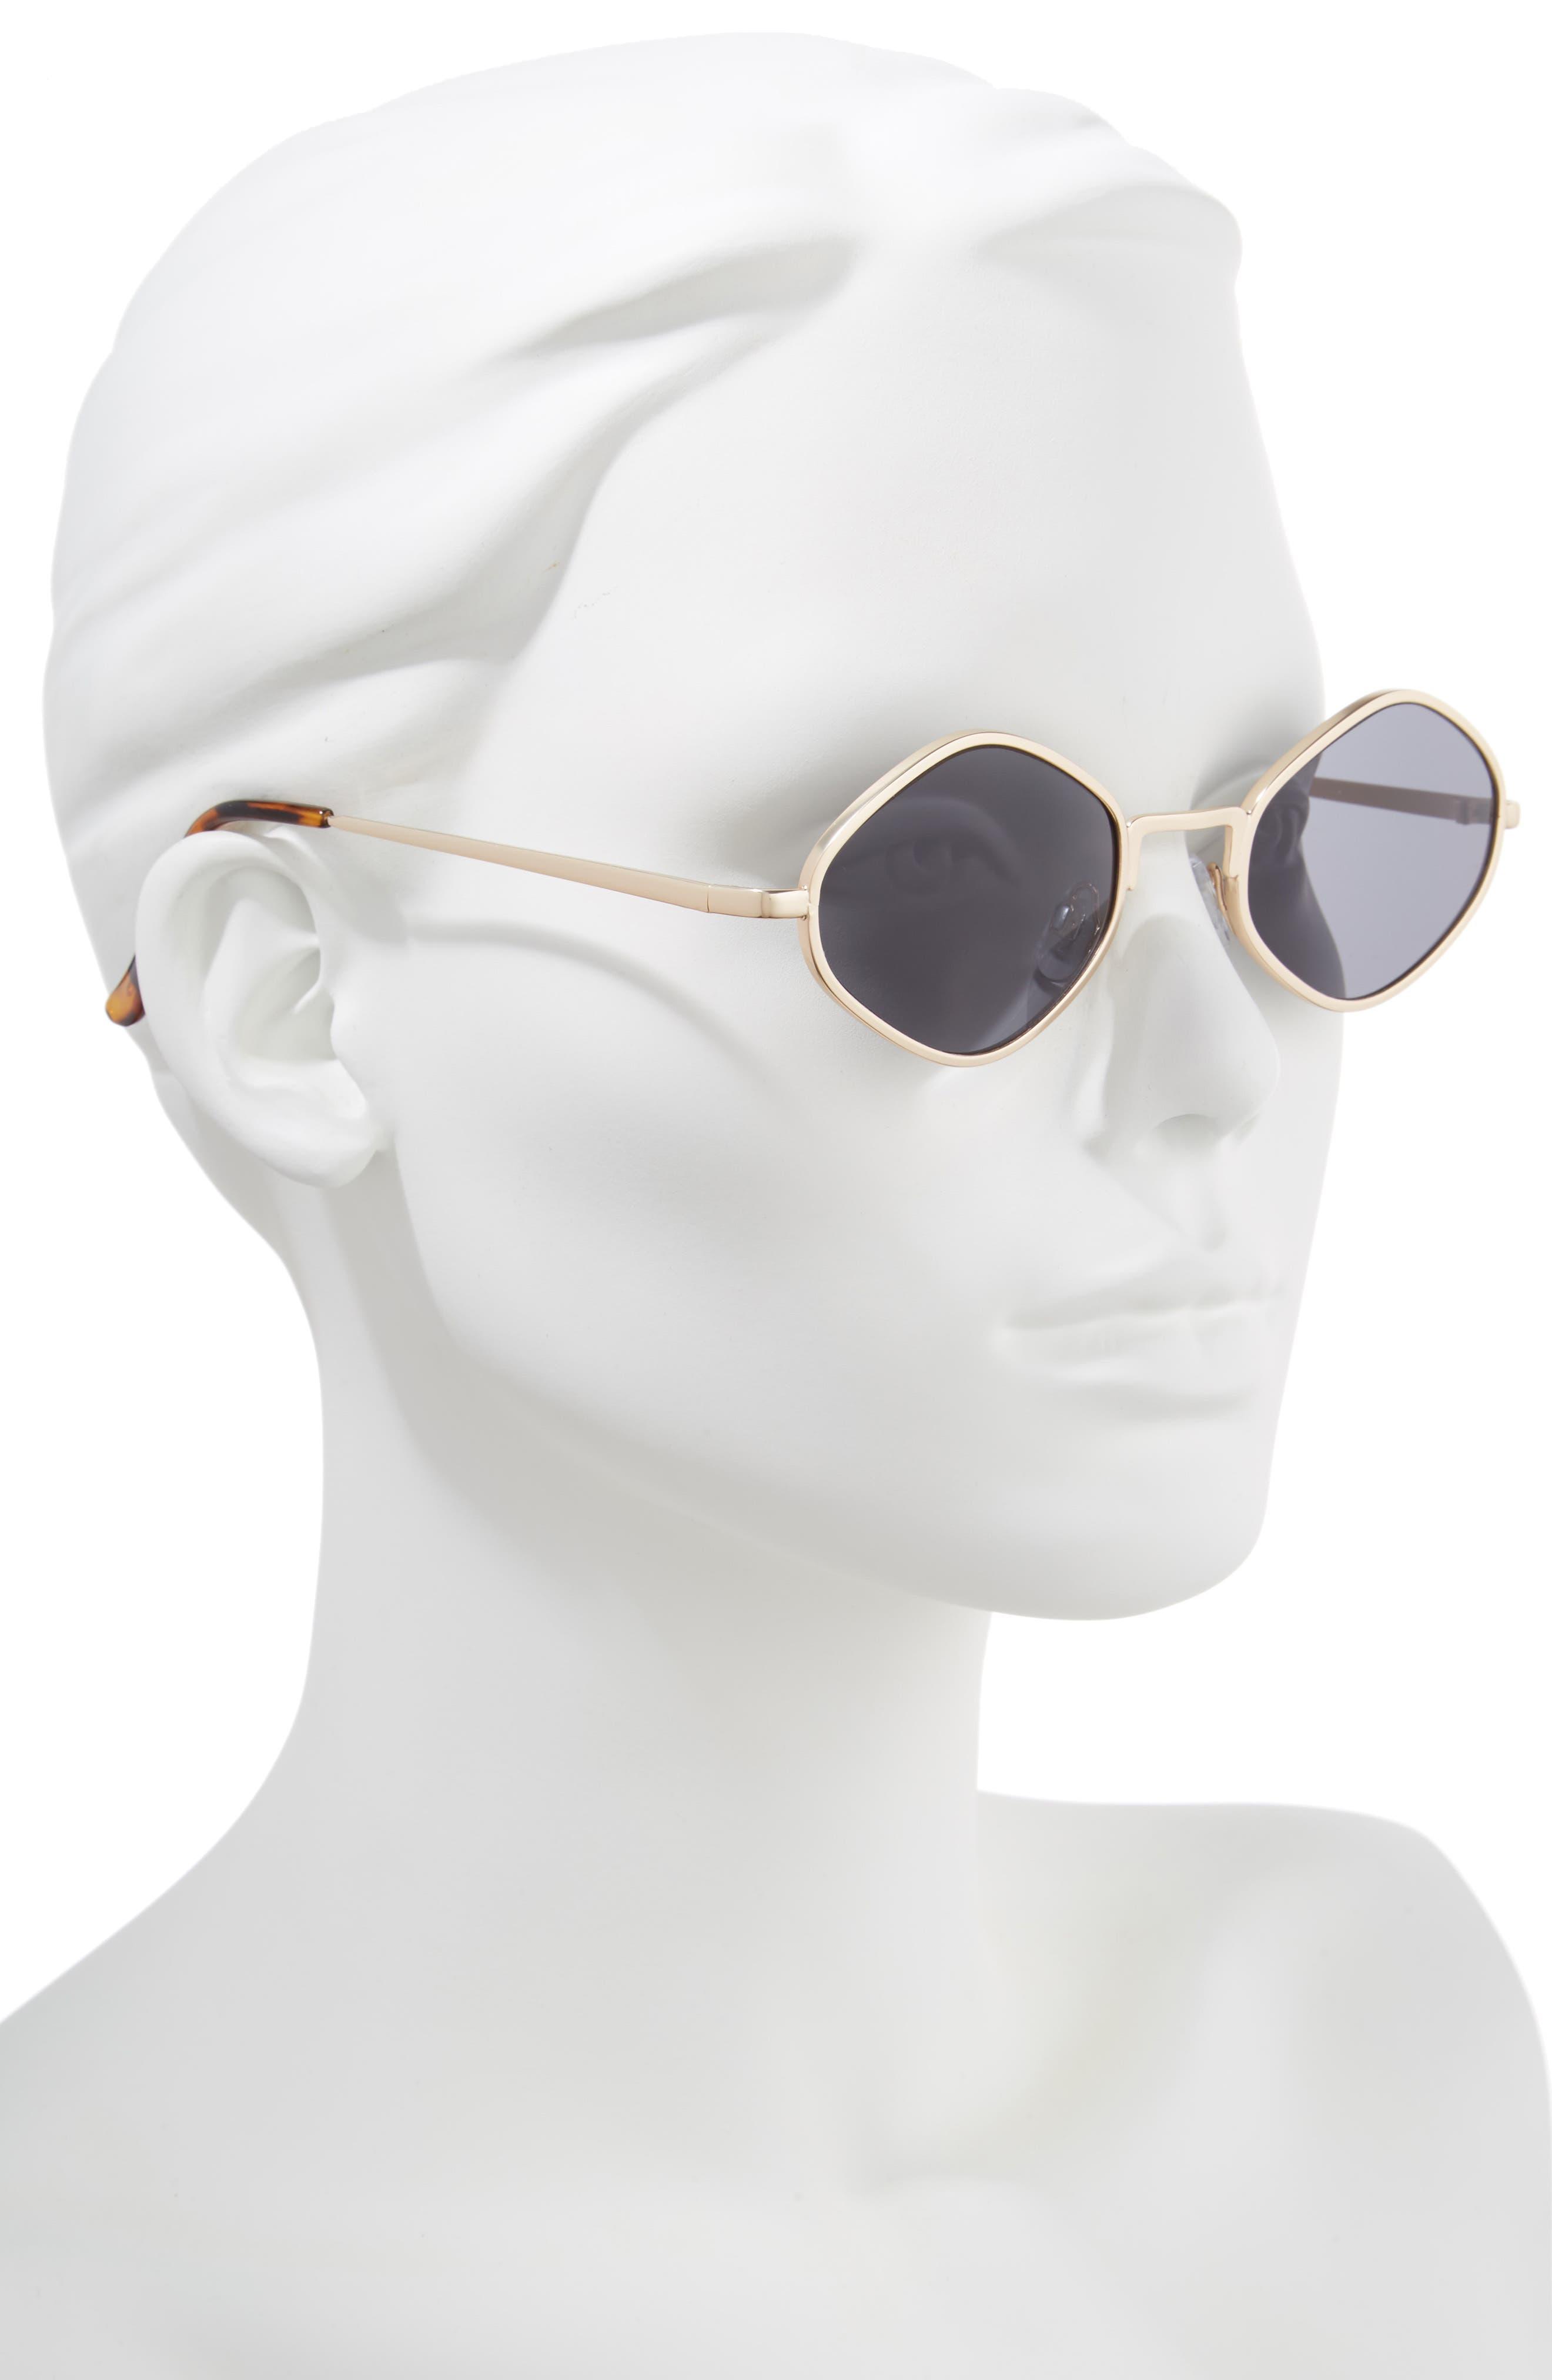 Geo Metal Sunglasses,                             Alternate thumbnail 2, color,                             Gold/ Tort